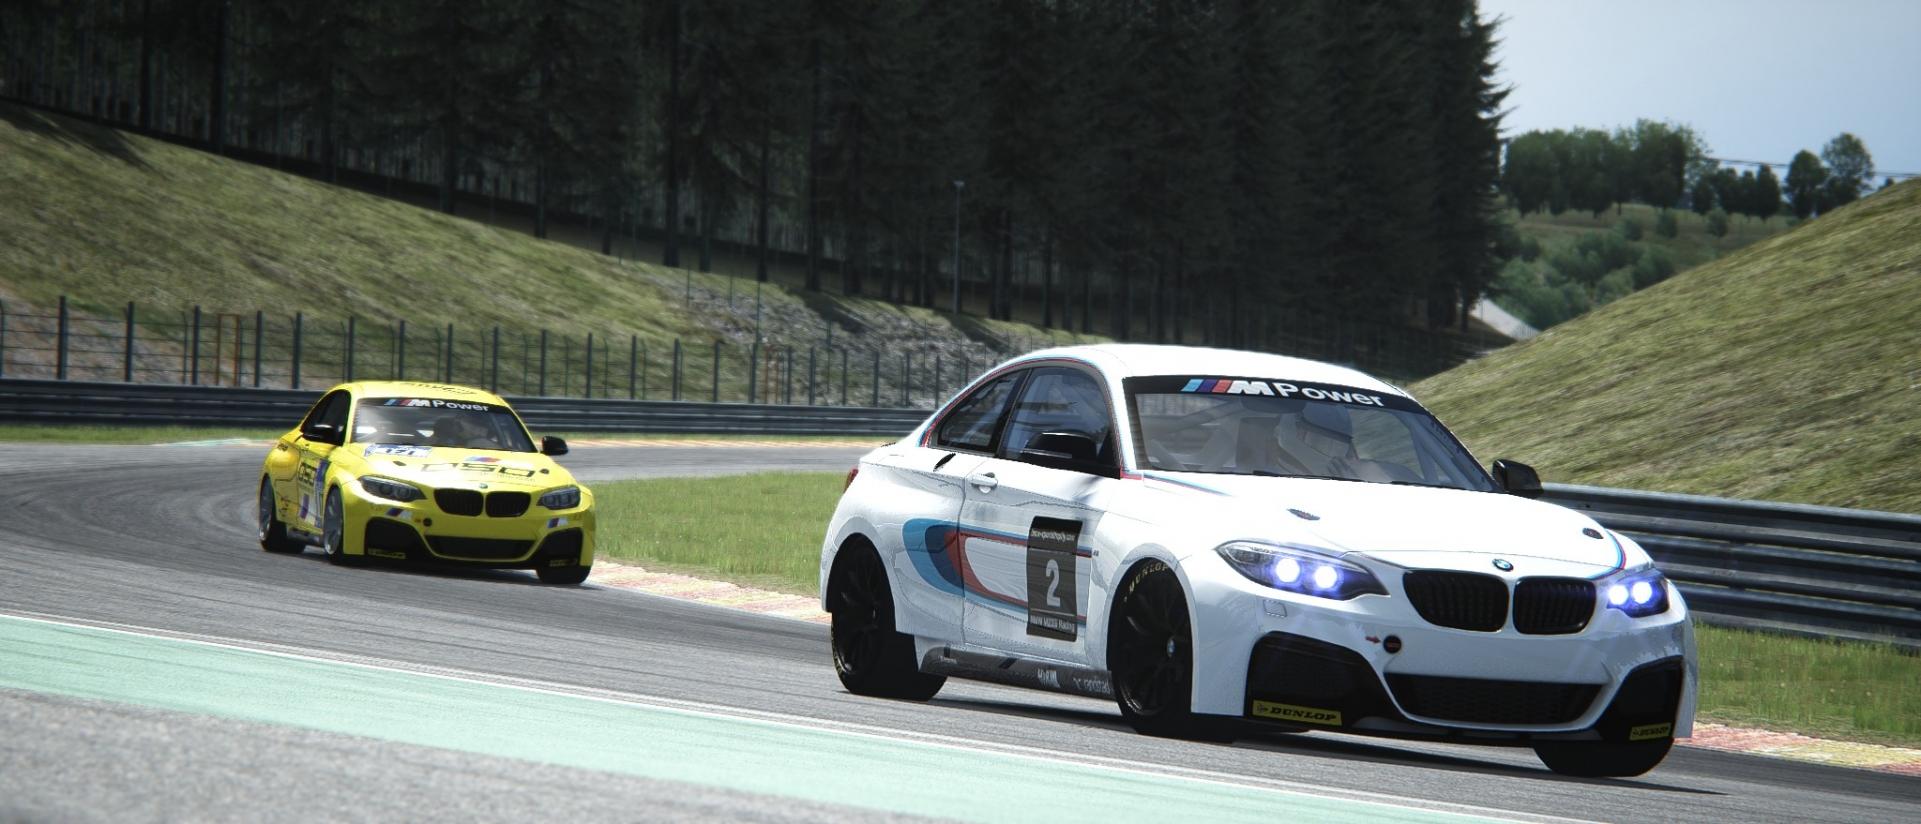 Assetto Corsa - BMW Battle 02